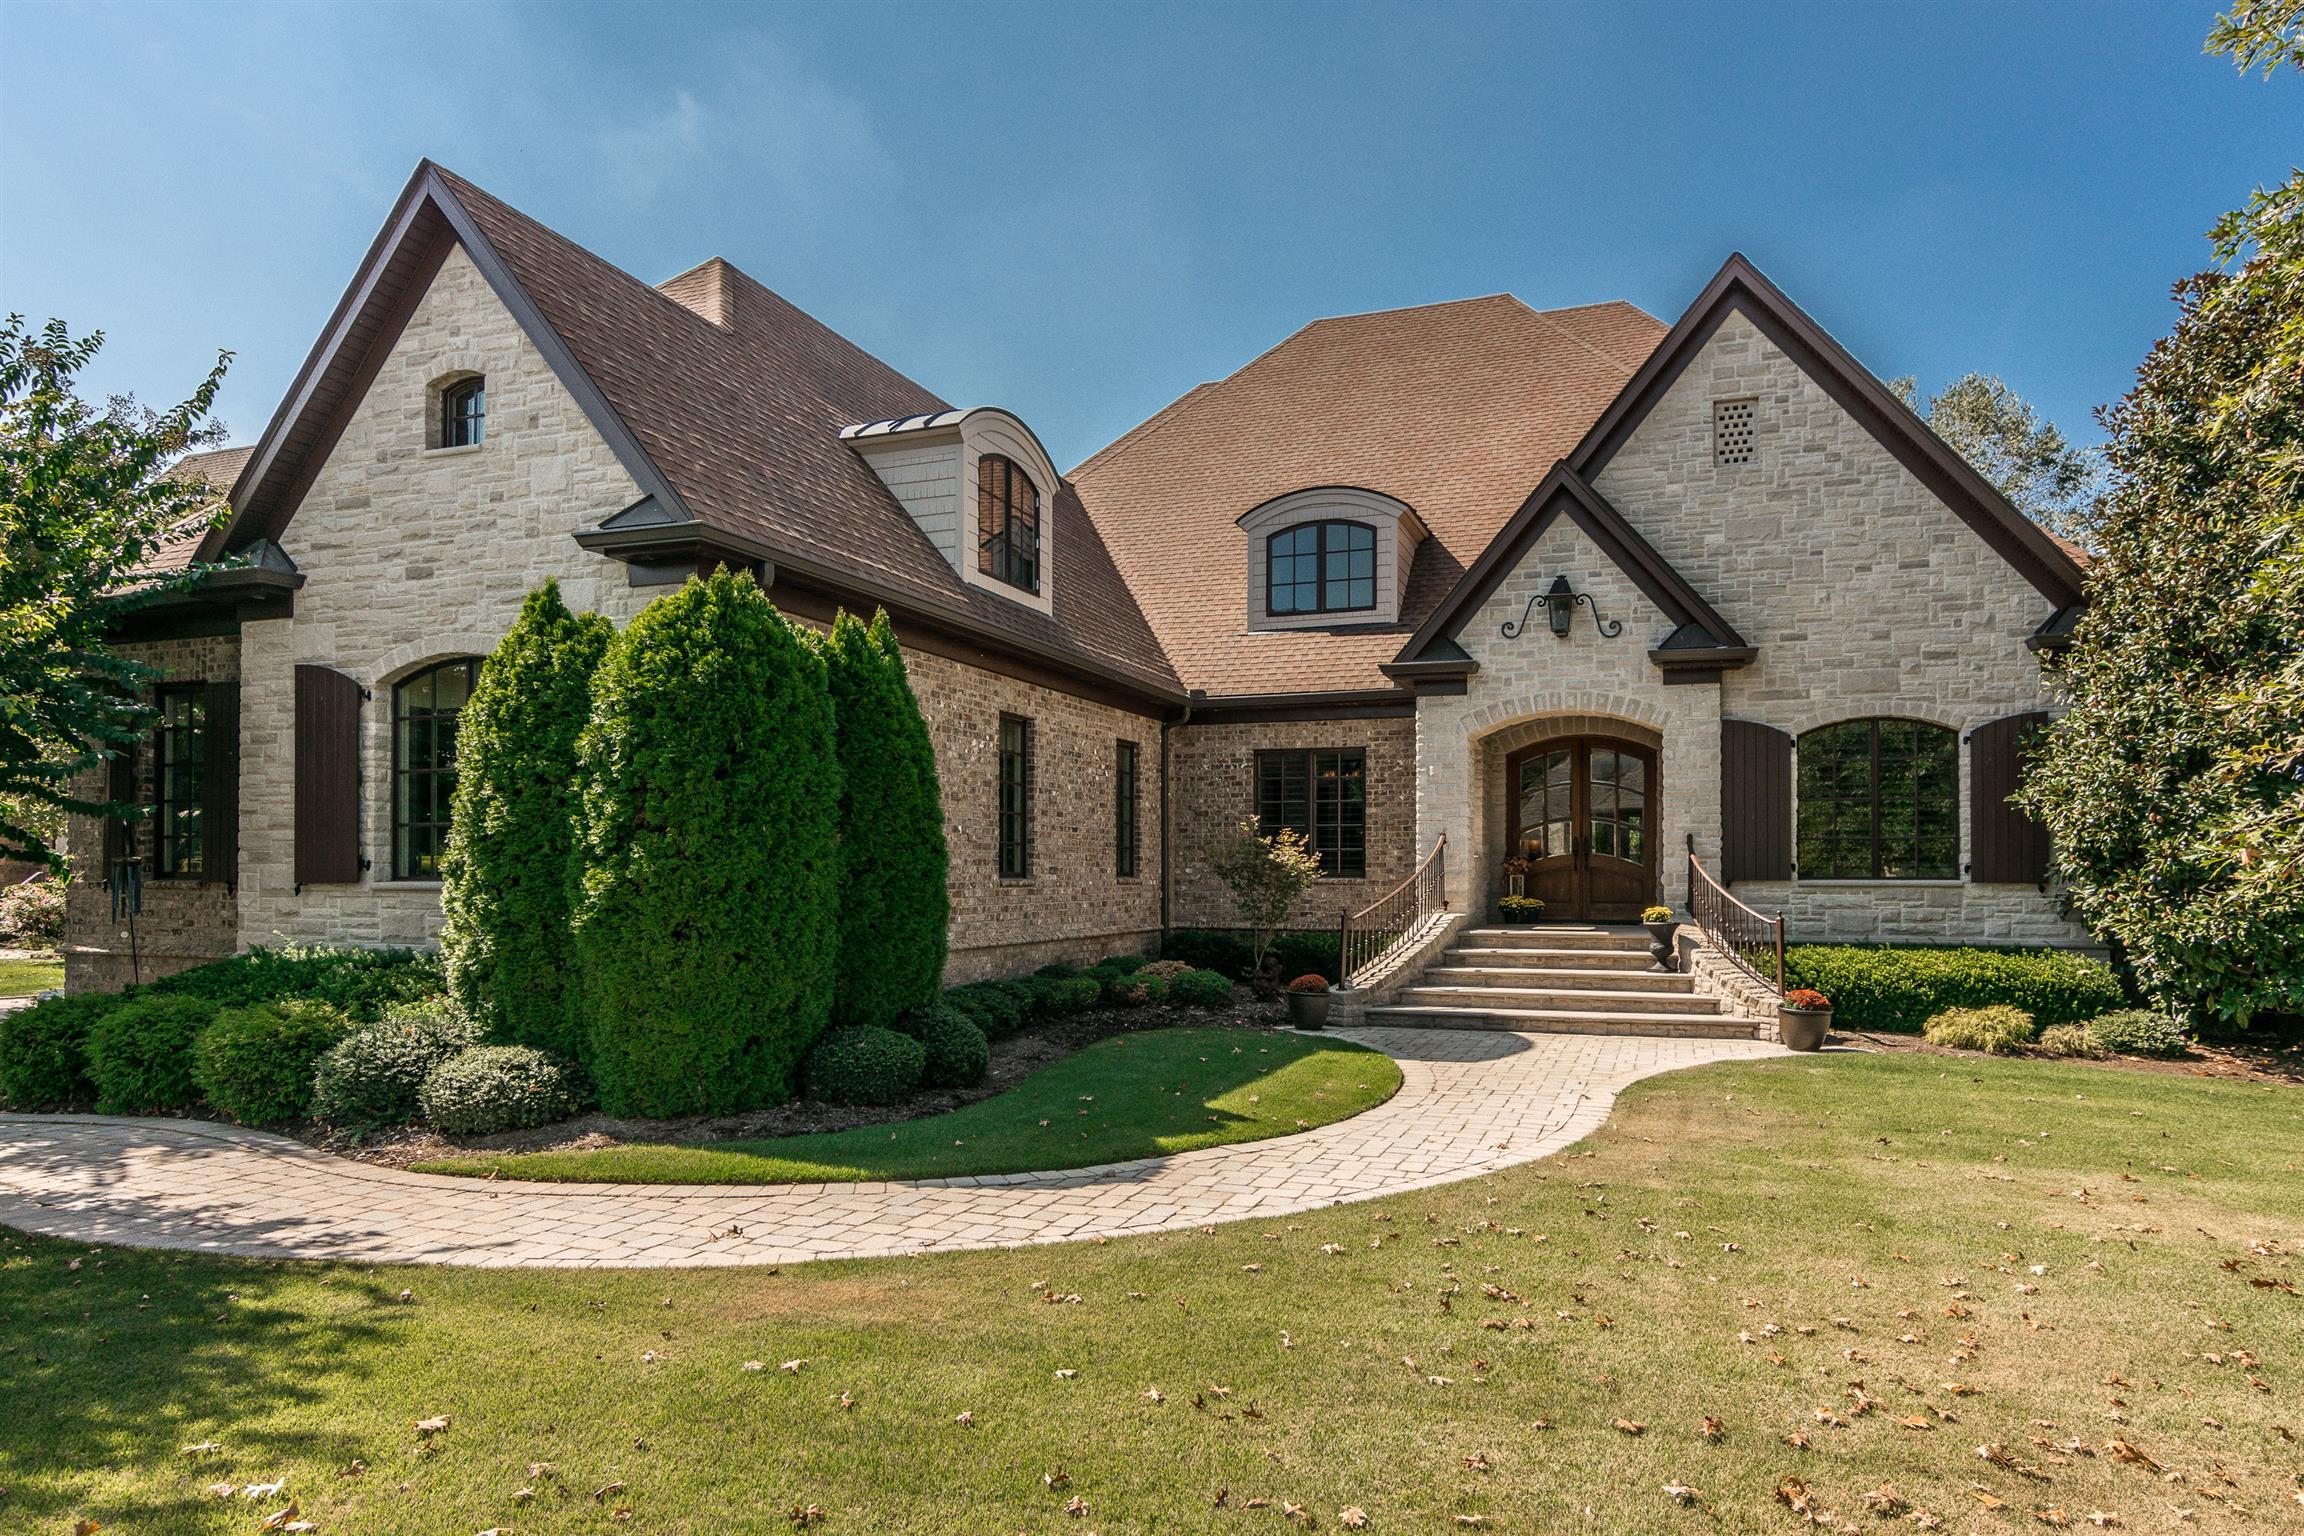 $998,000 - 5Br/5Ba -  for Sale in Fairvue Plantation, Gallatin